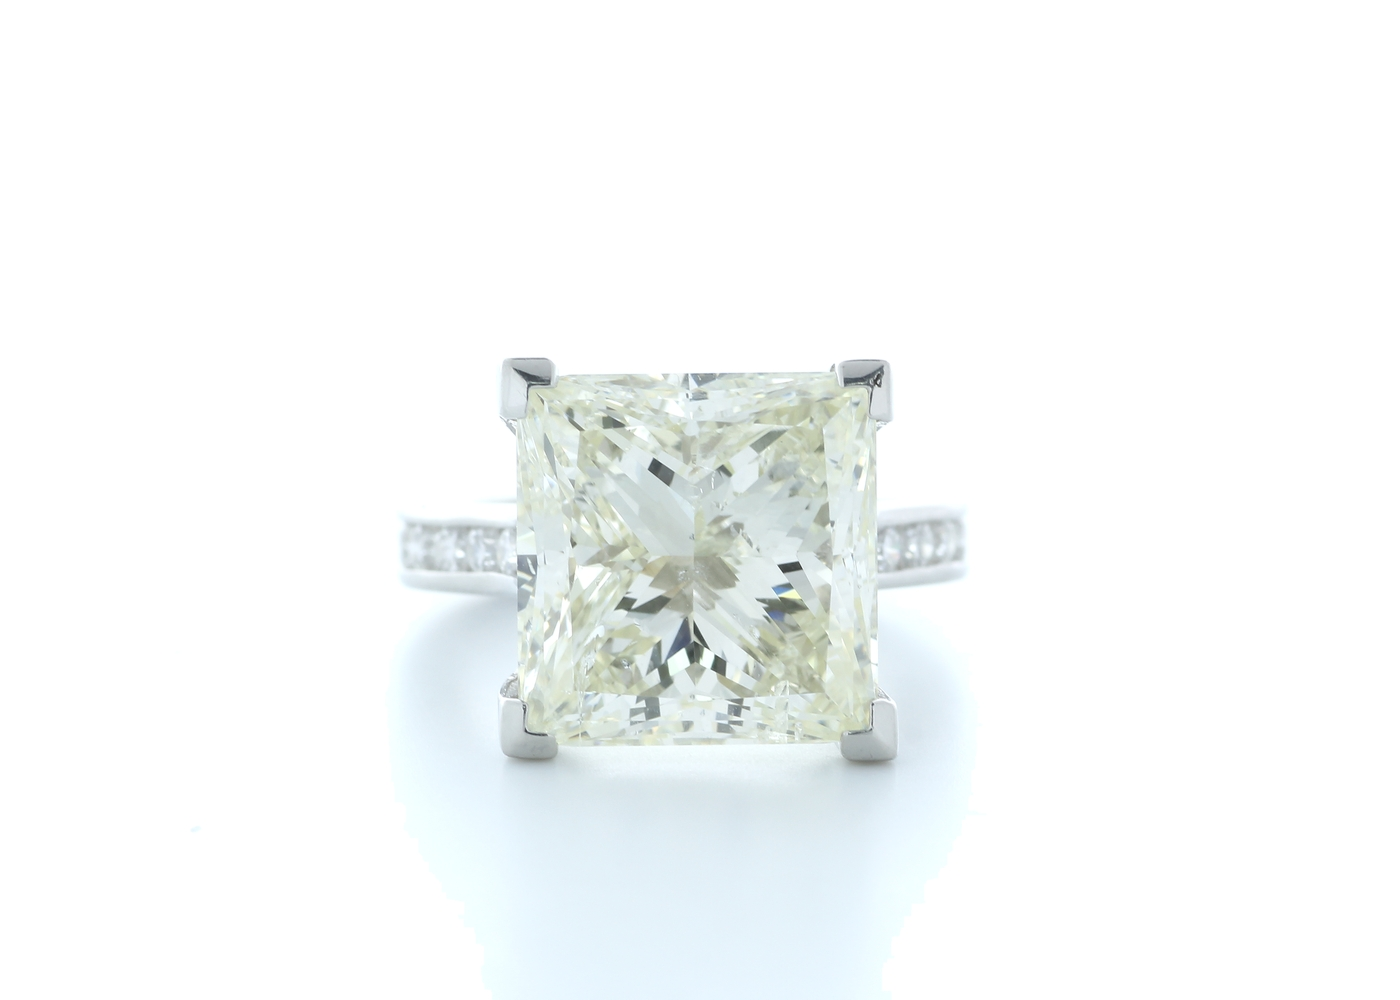 18ct White Gold Princess Cut Diamond Ring 10.00 Carats